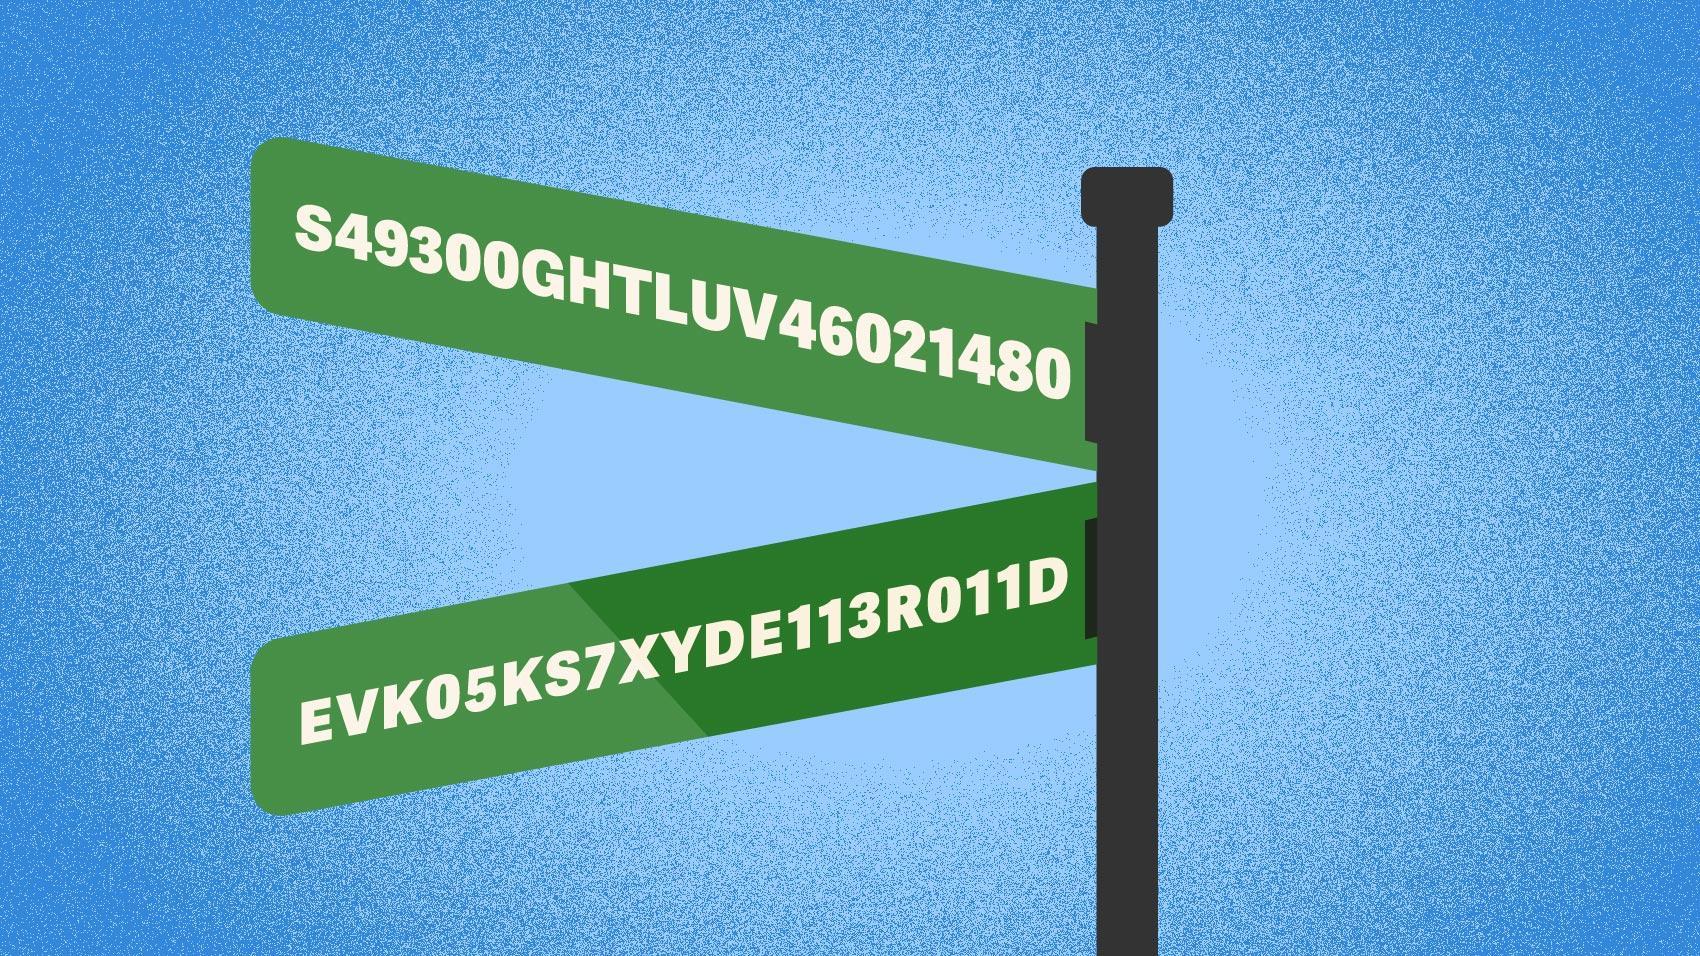 Legal Entity Identifiers blg image